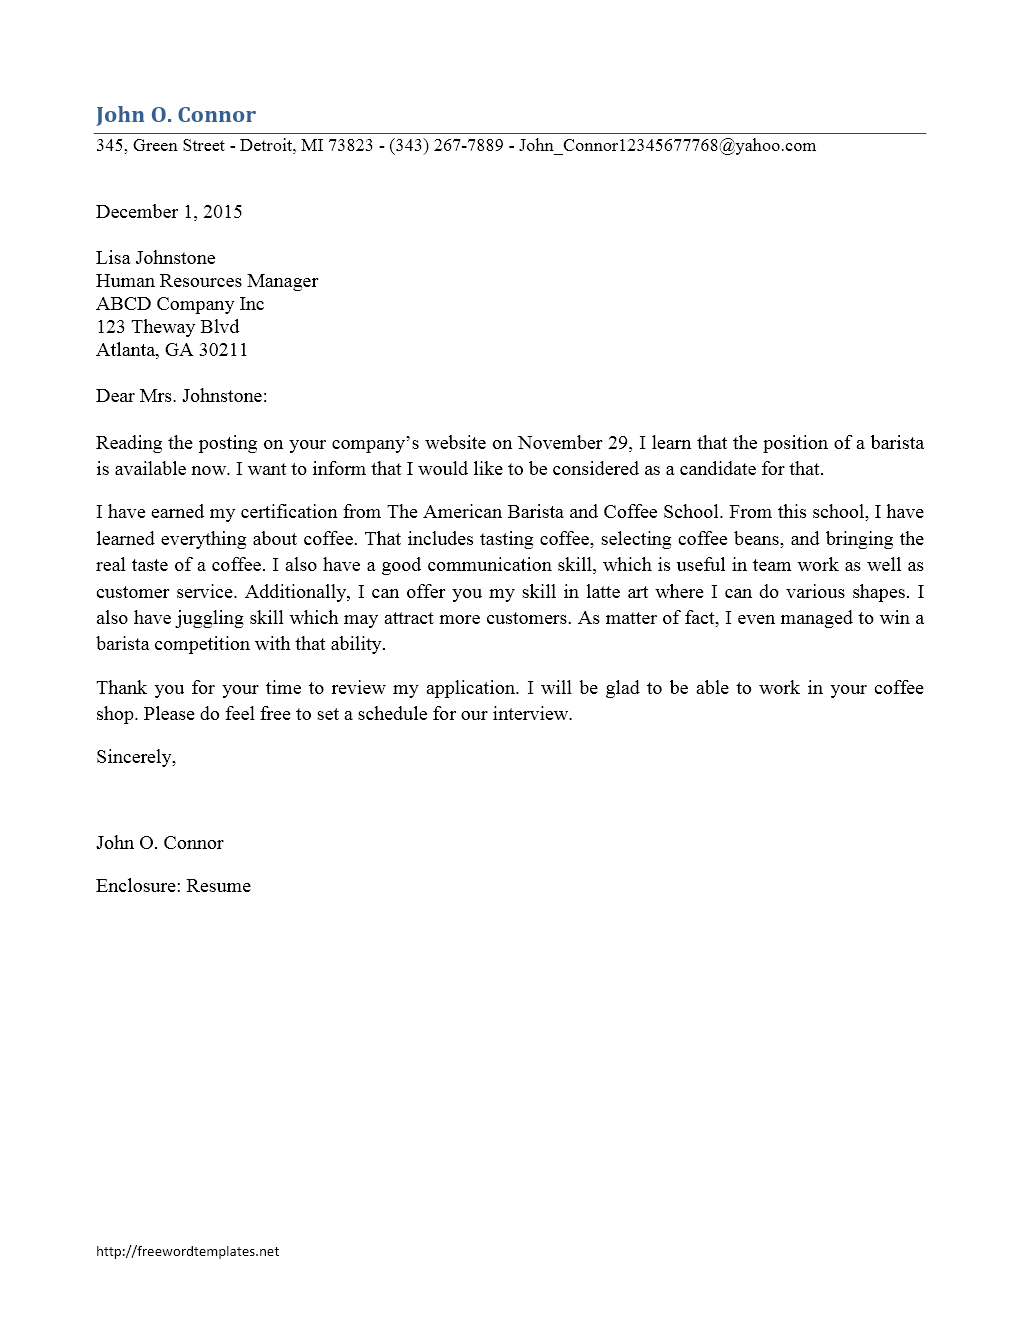 Cover Letter Template Barista